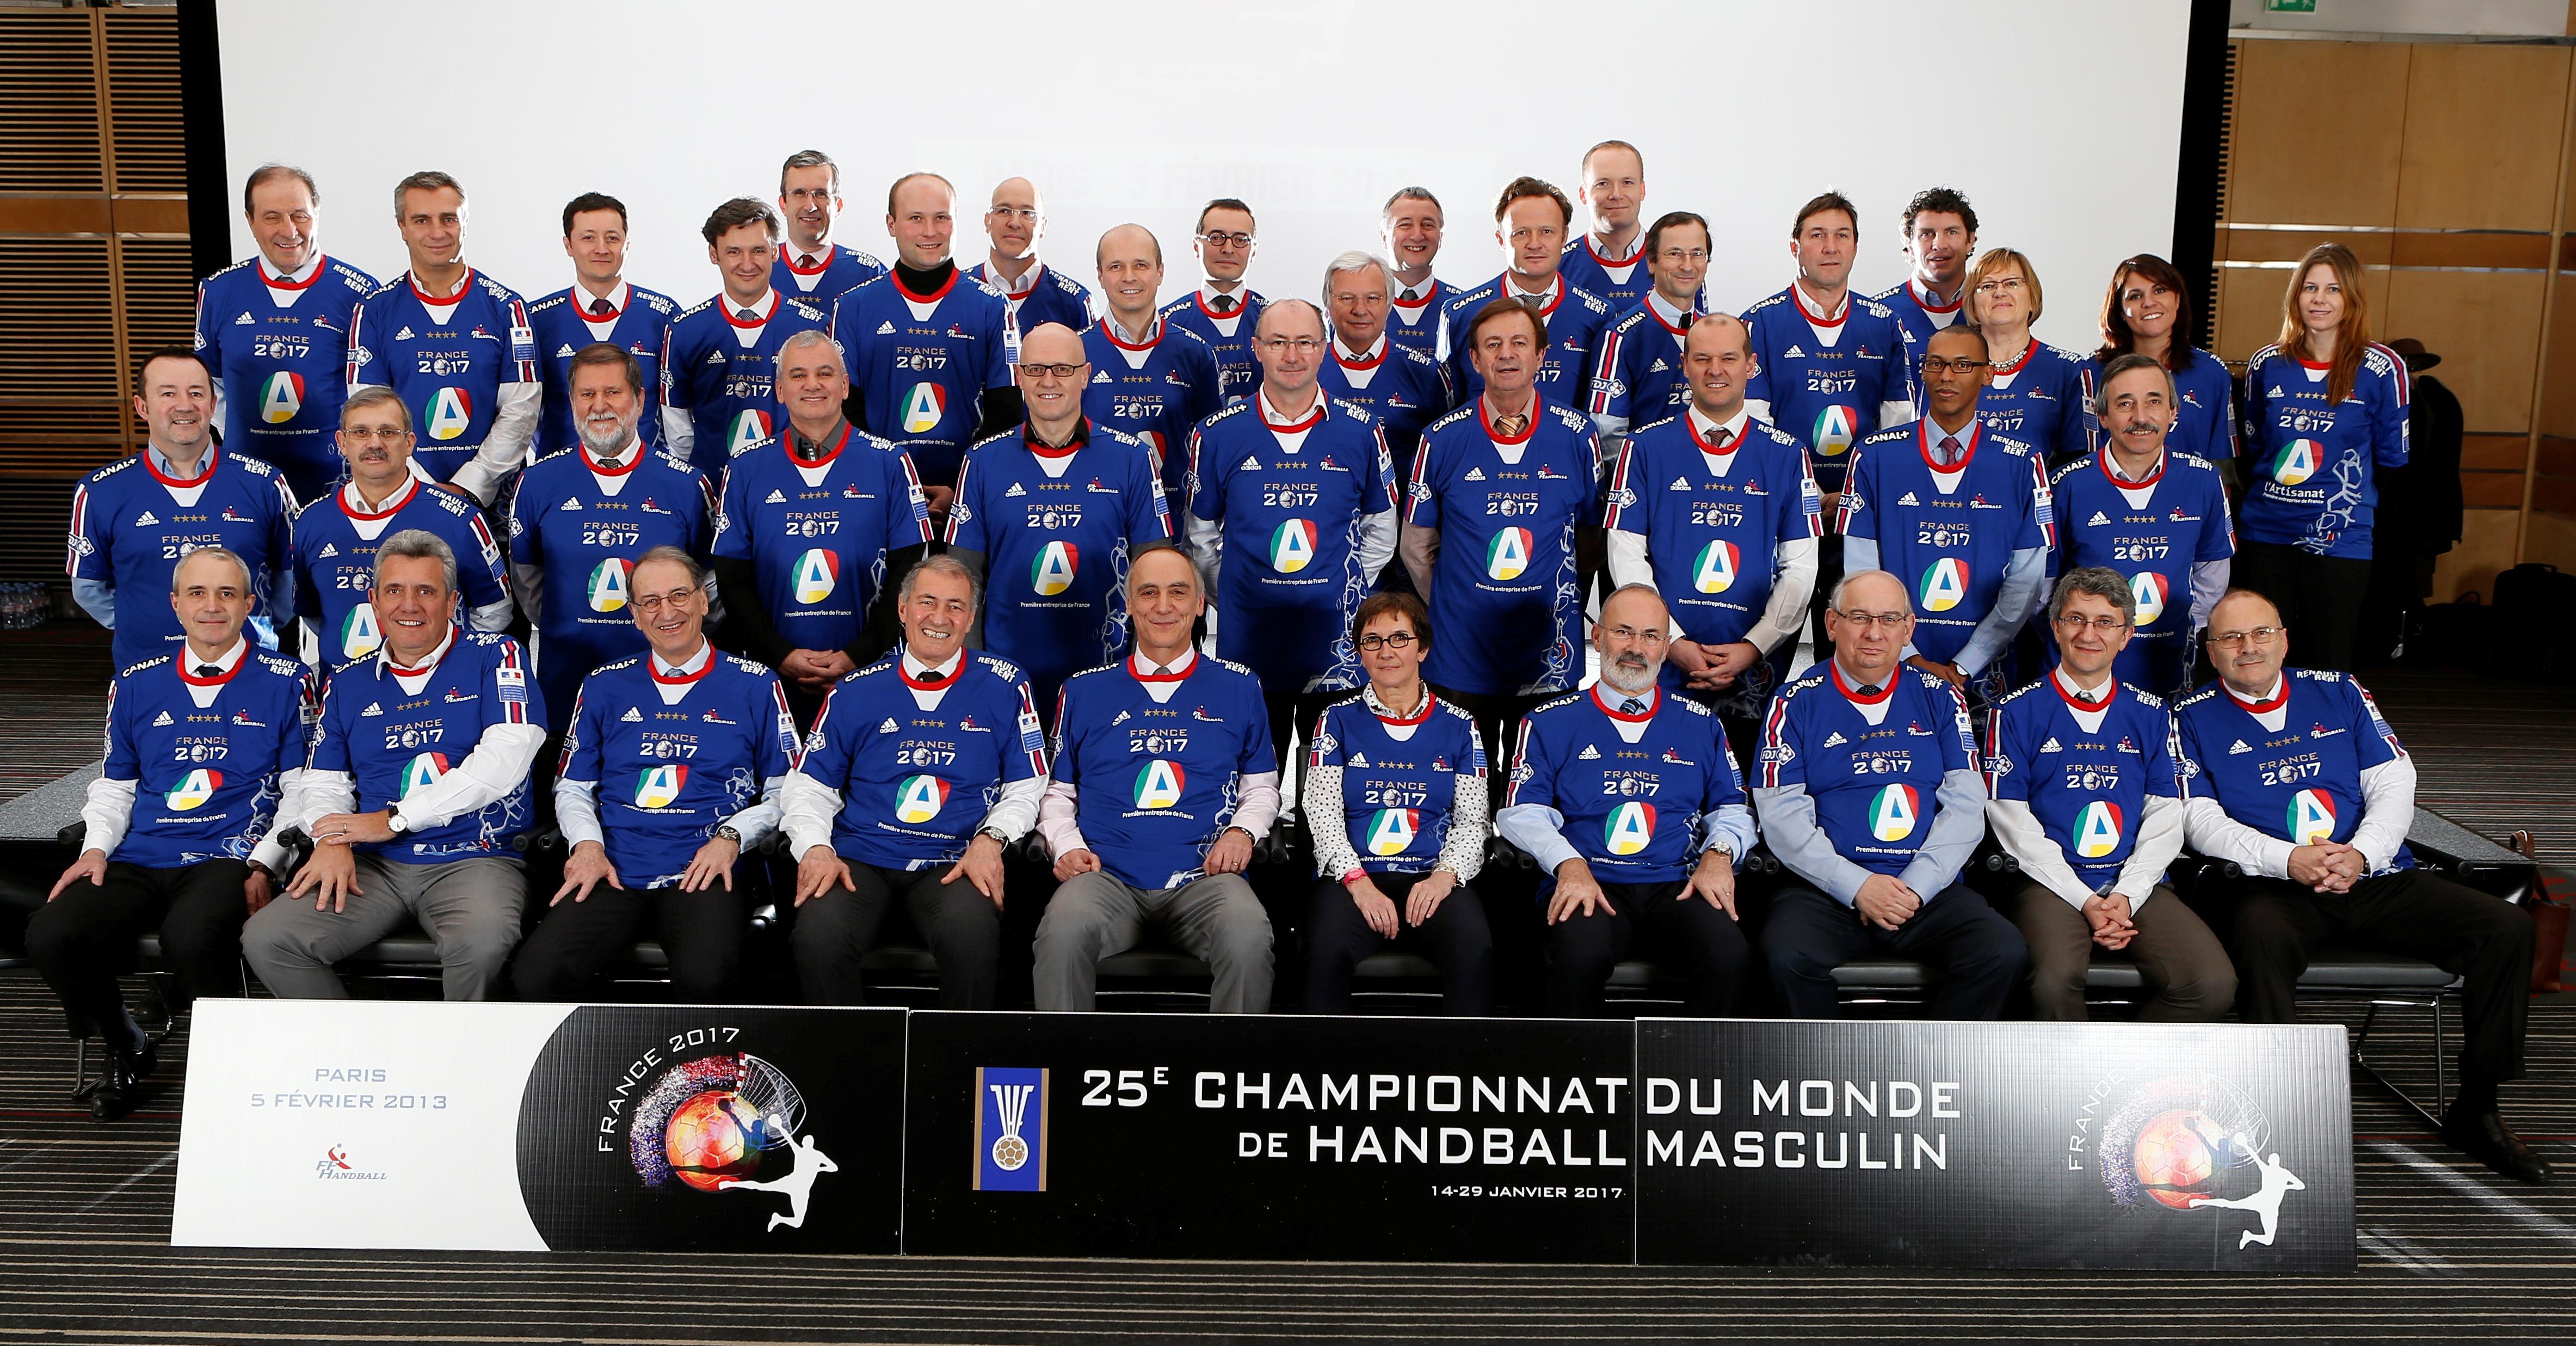 U4p3814ok - Coupe du monde handball 2013 ...